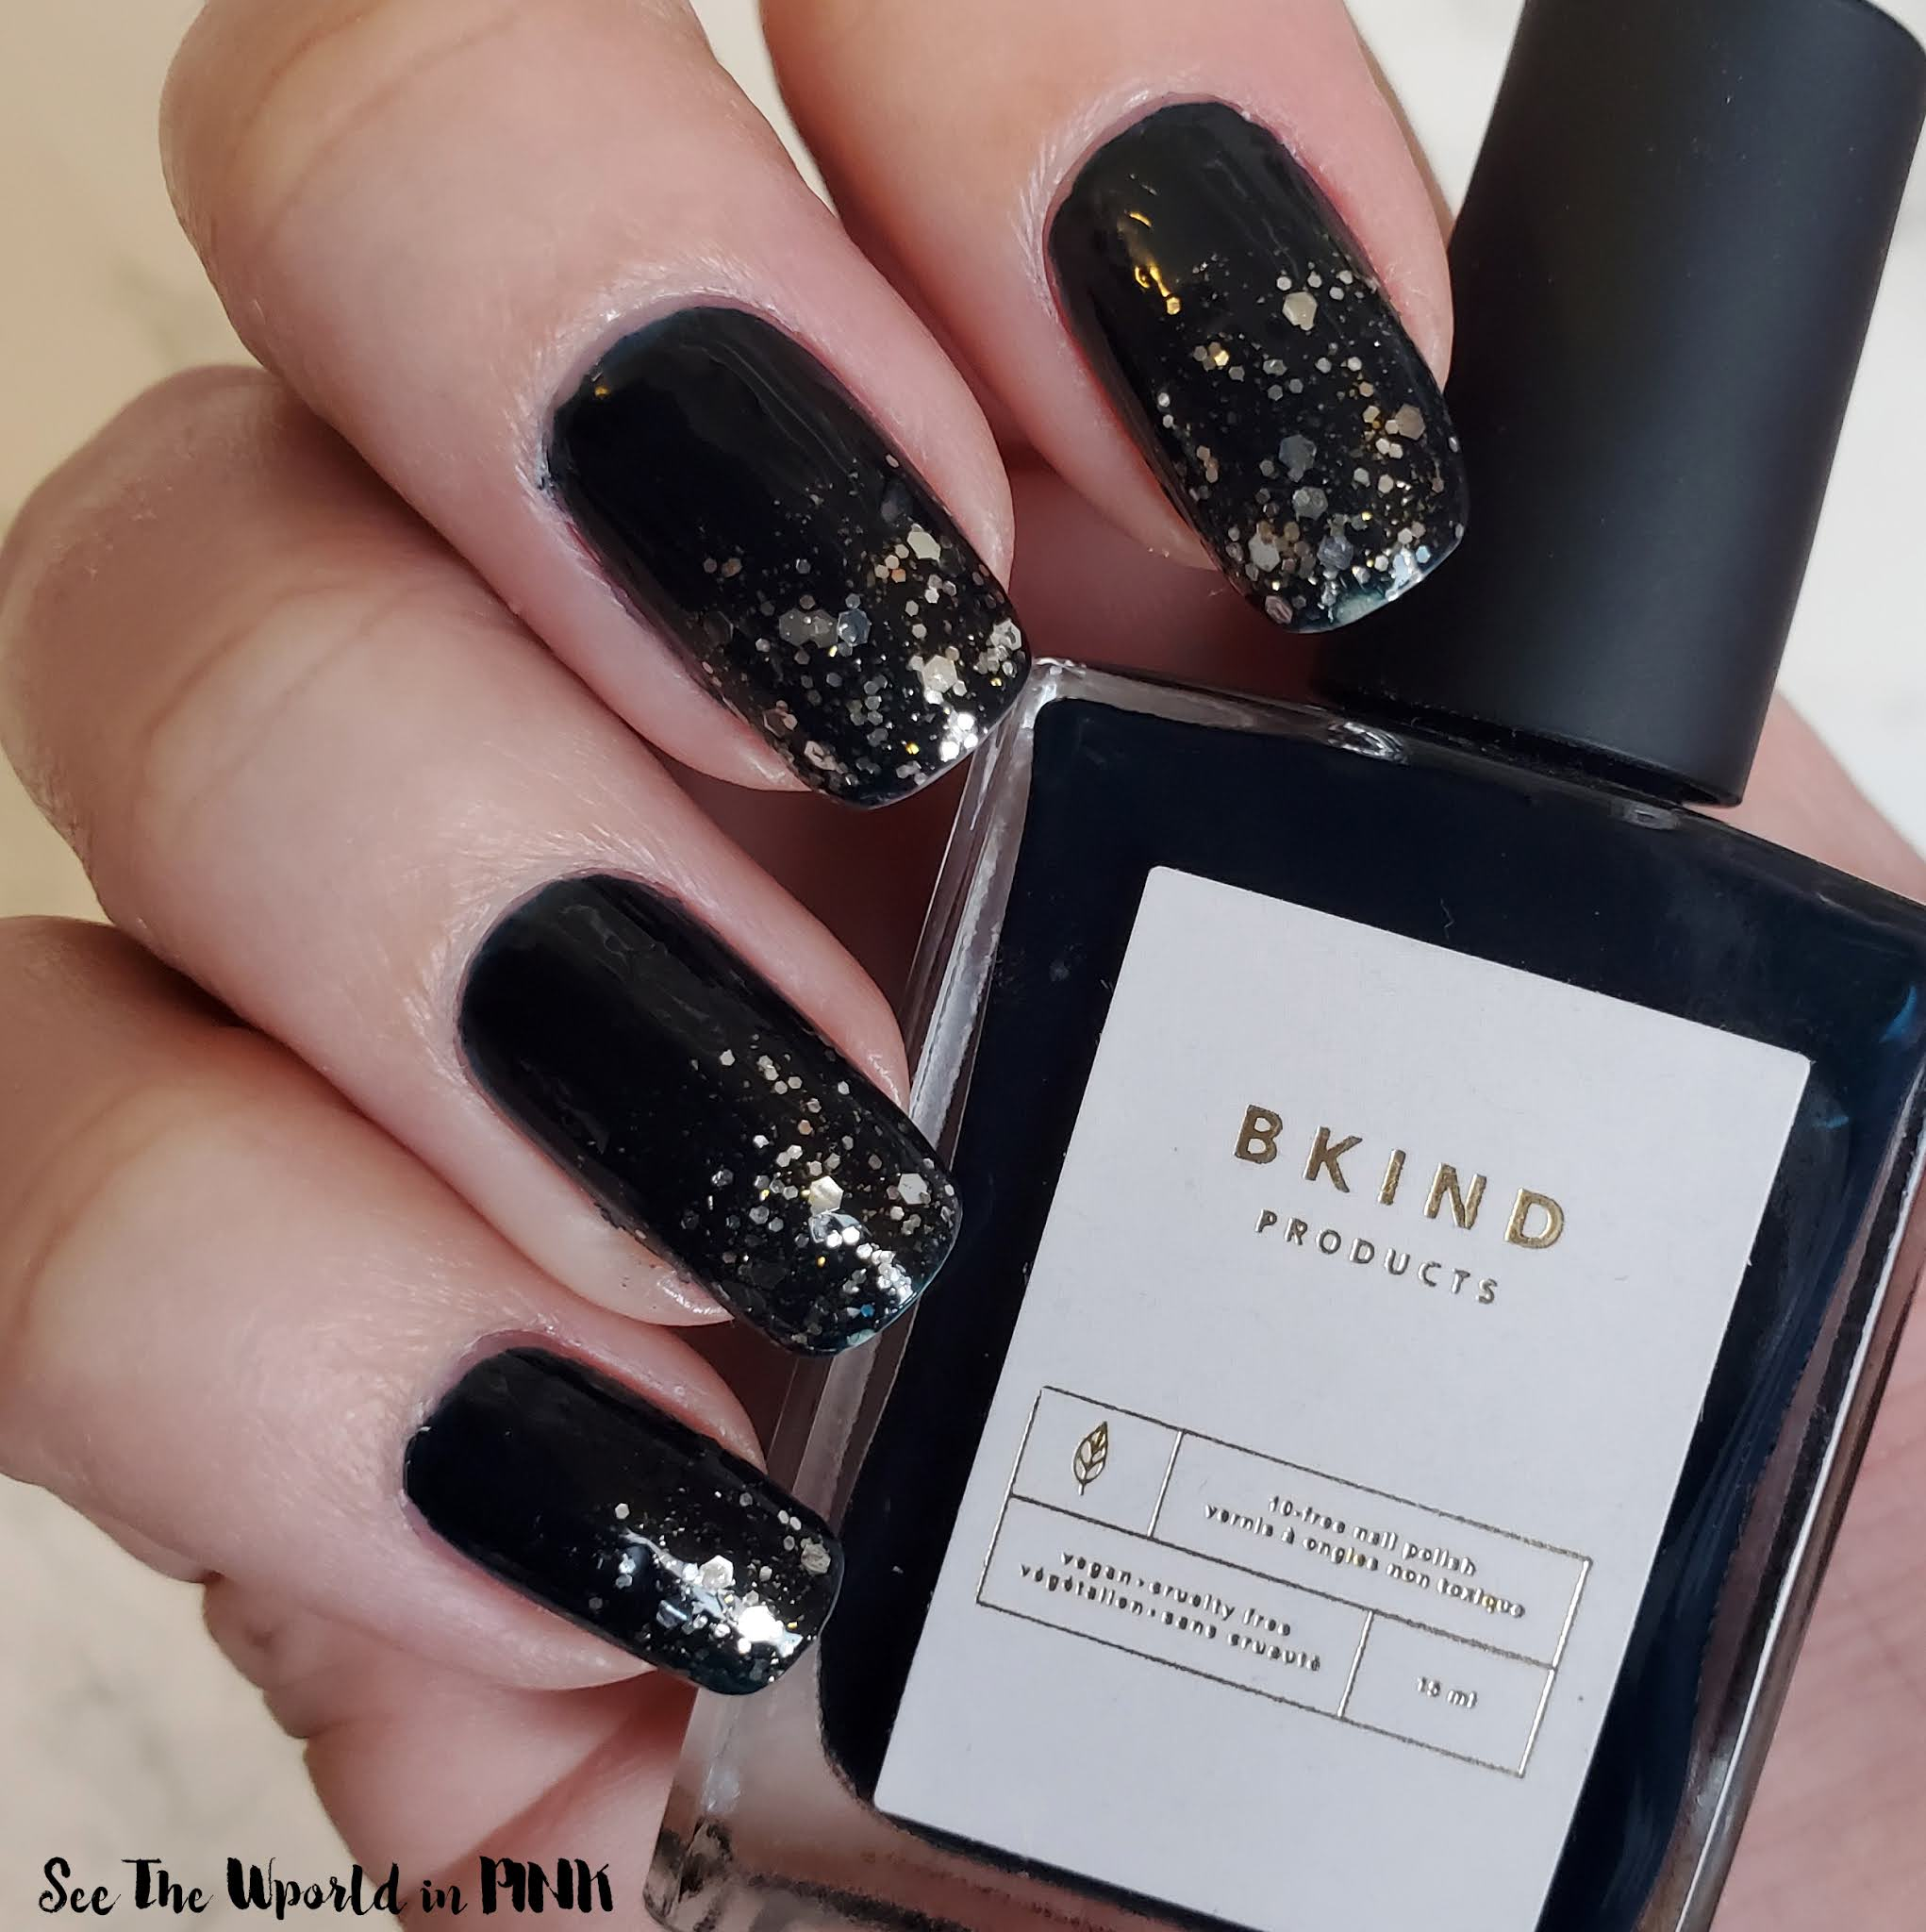 Manicure Tuesday - BKIND polish & Ombre Glitter Polish